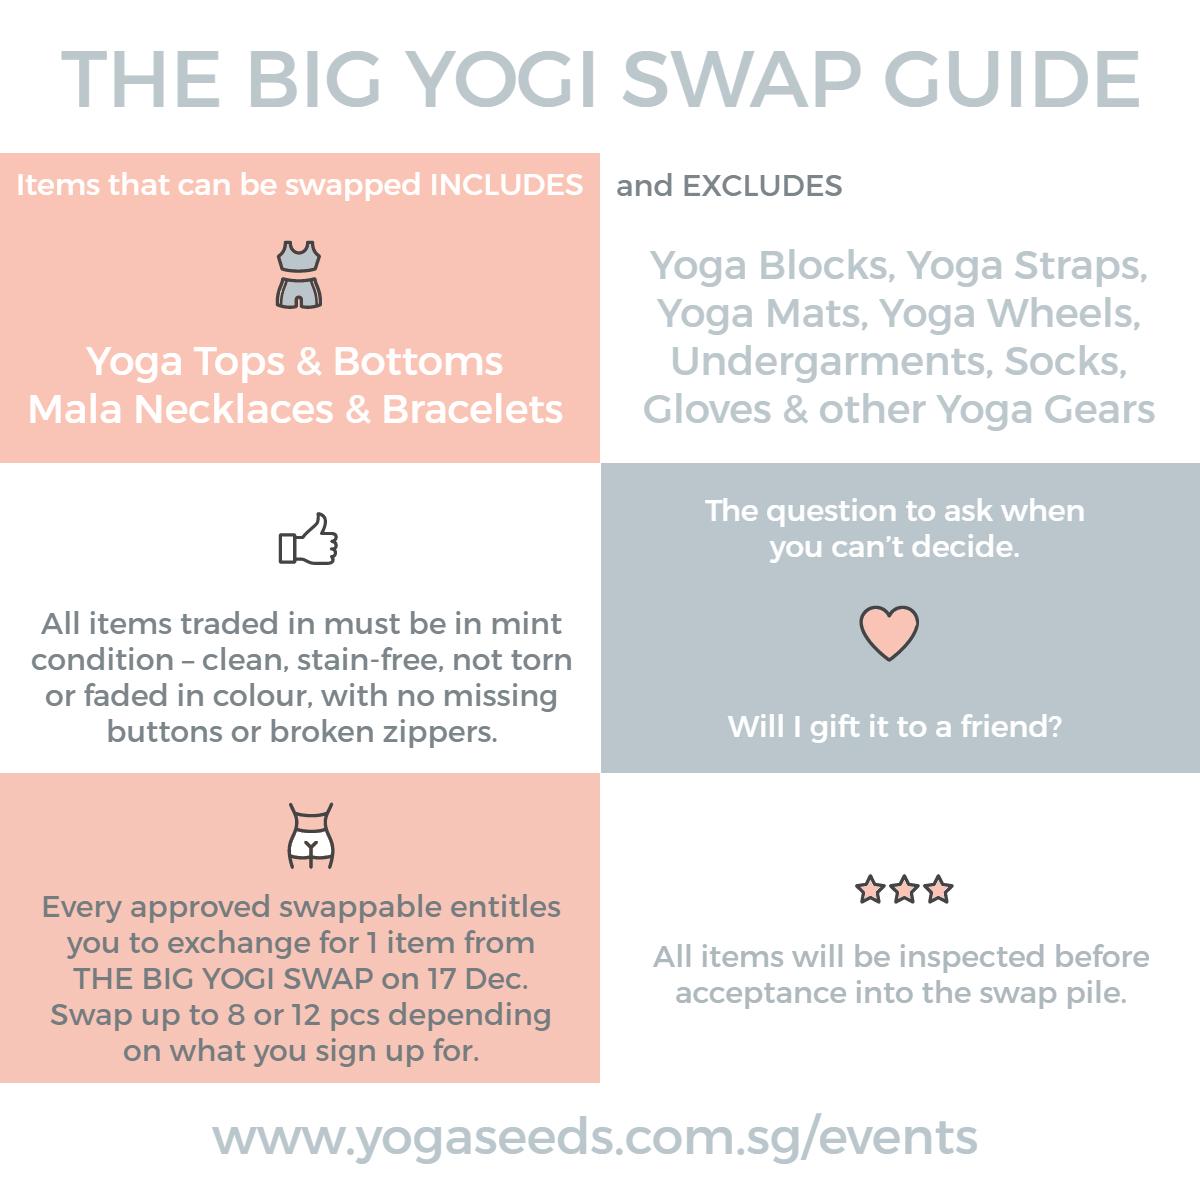 THE BIG YOGI SWAP GUIDE   Yoga Seeds